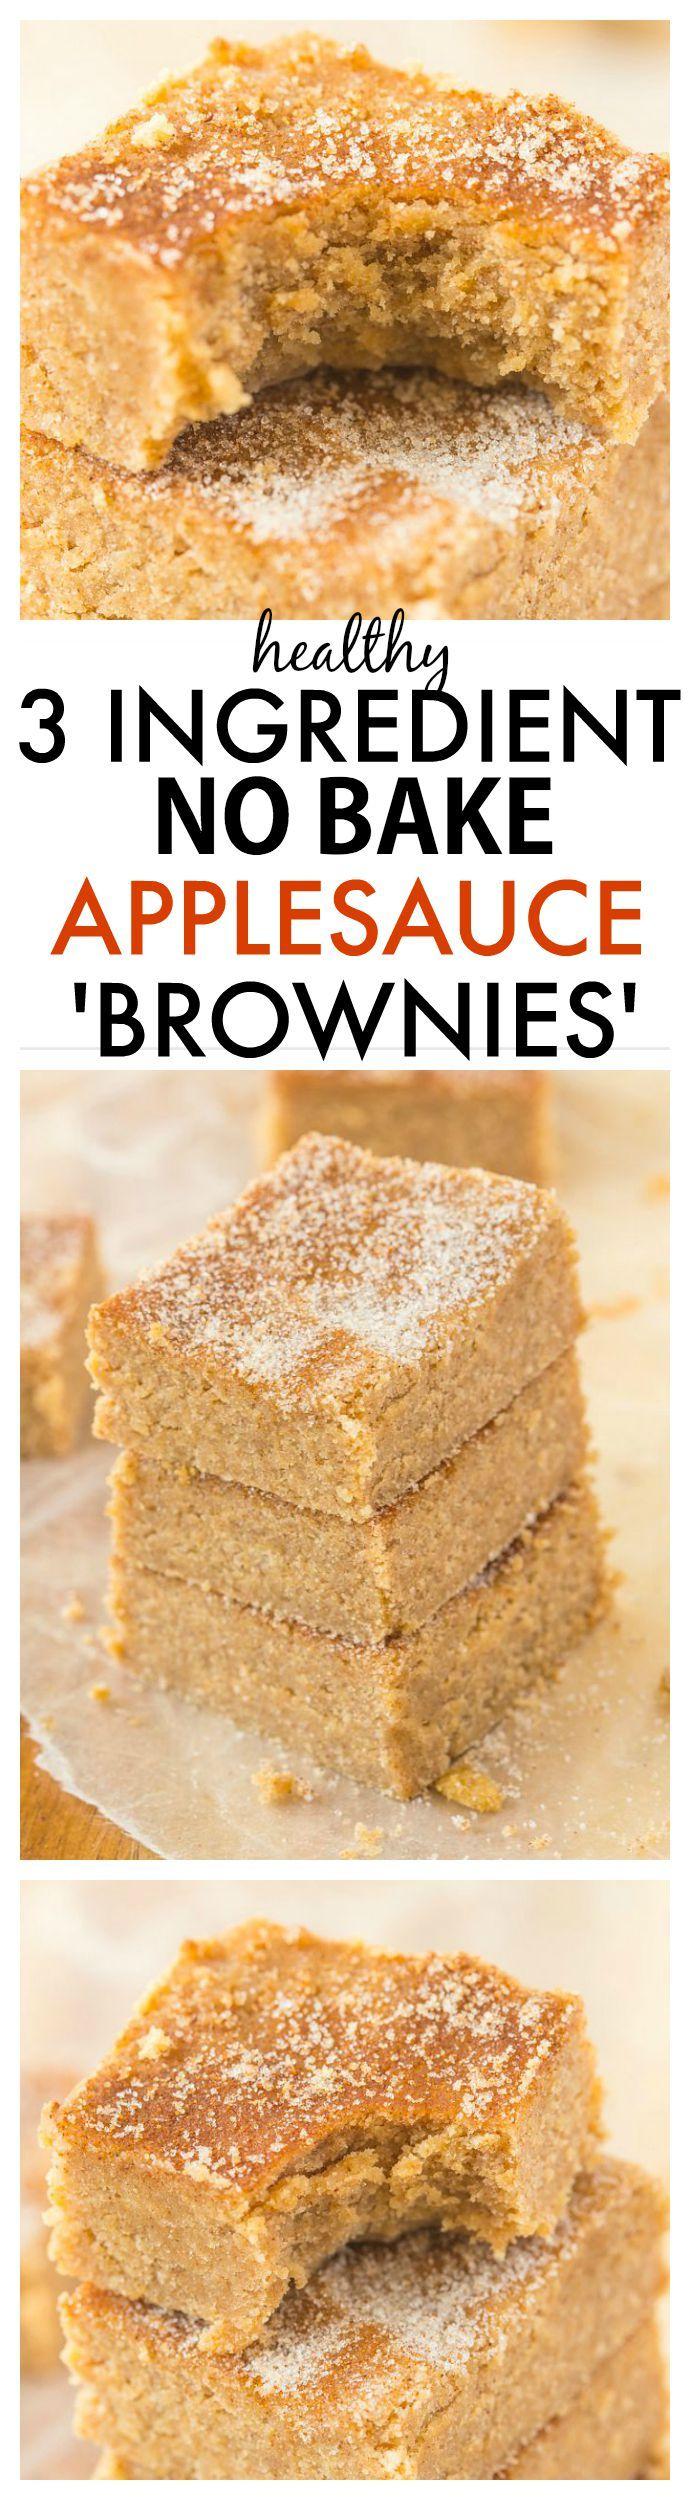 easy bake brownies instructions